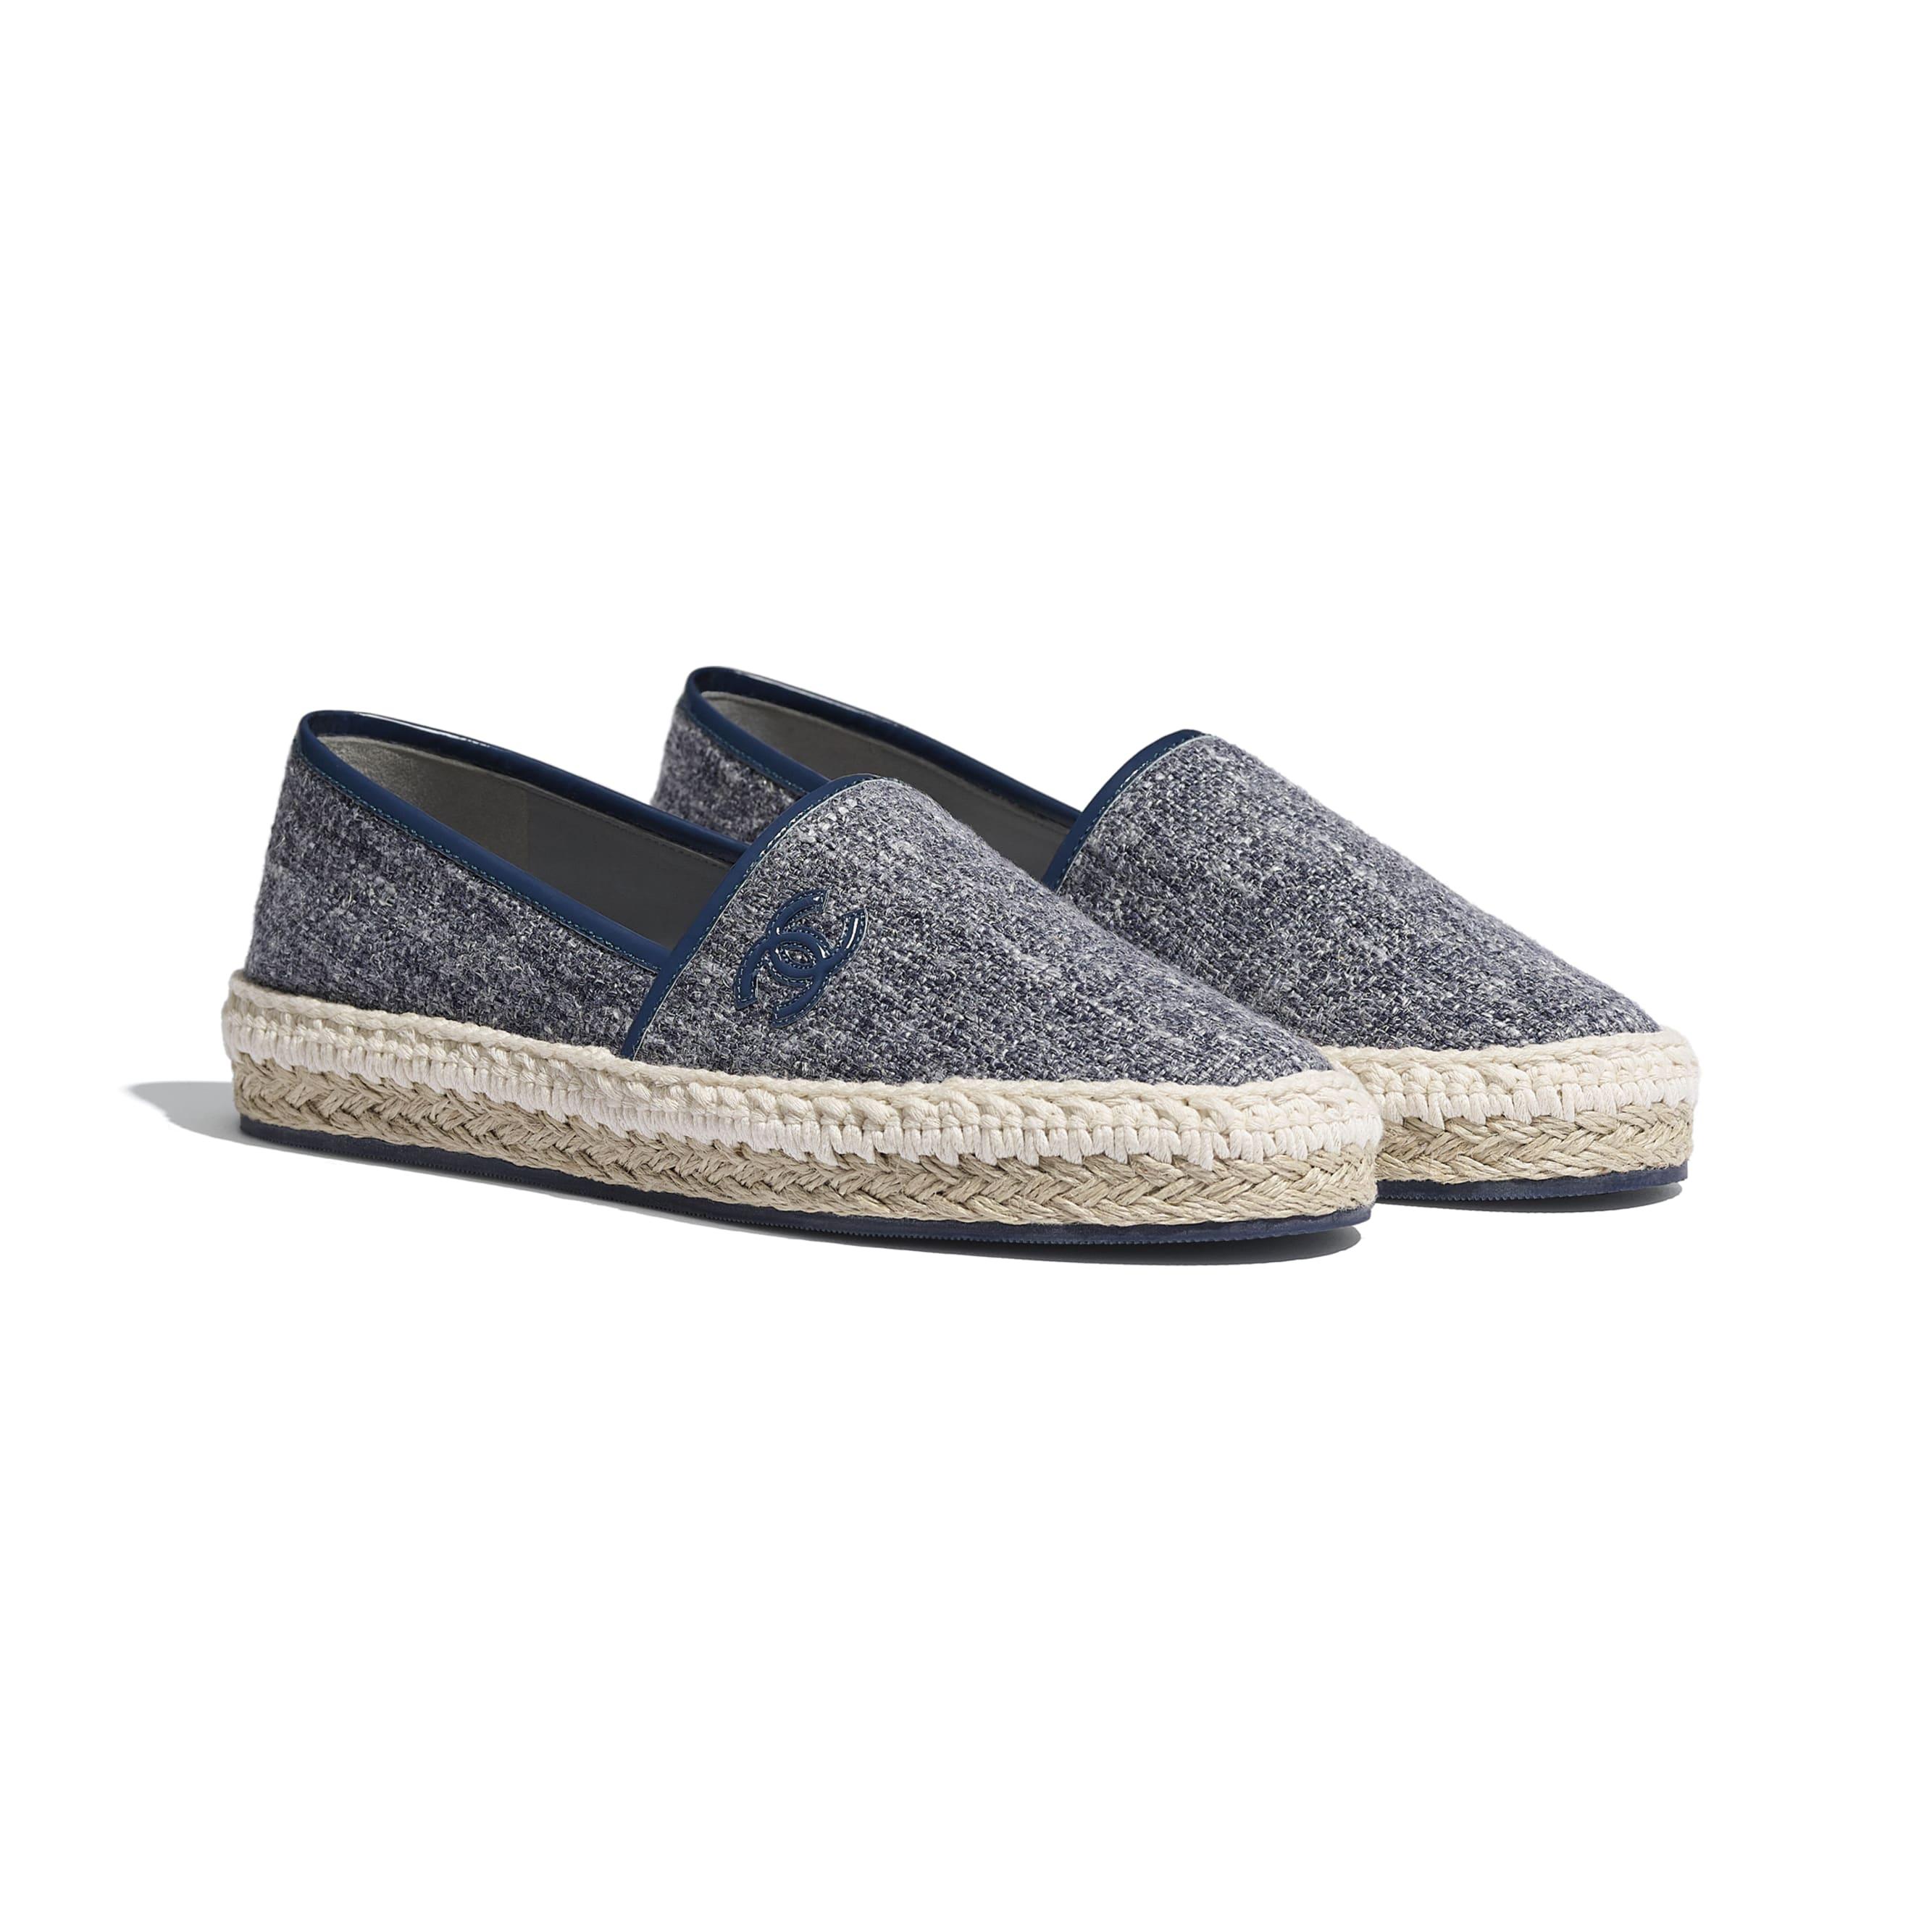 Espadrilles - Blue & Gray - Fabric & Patent Calfskin - CHANEL - Alternative view - see standard sized version